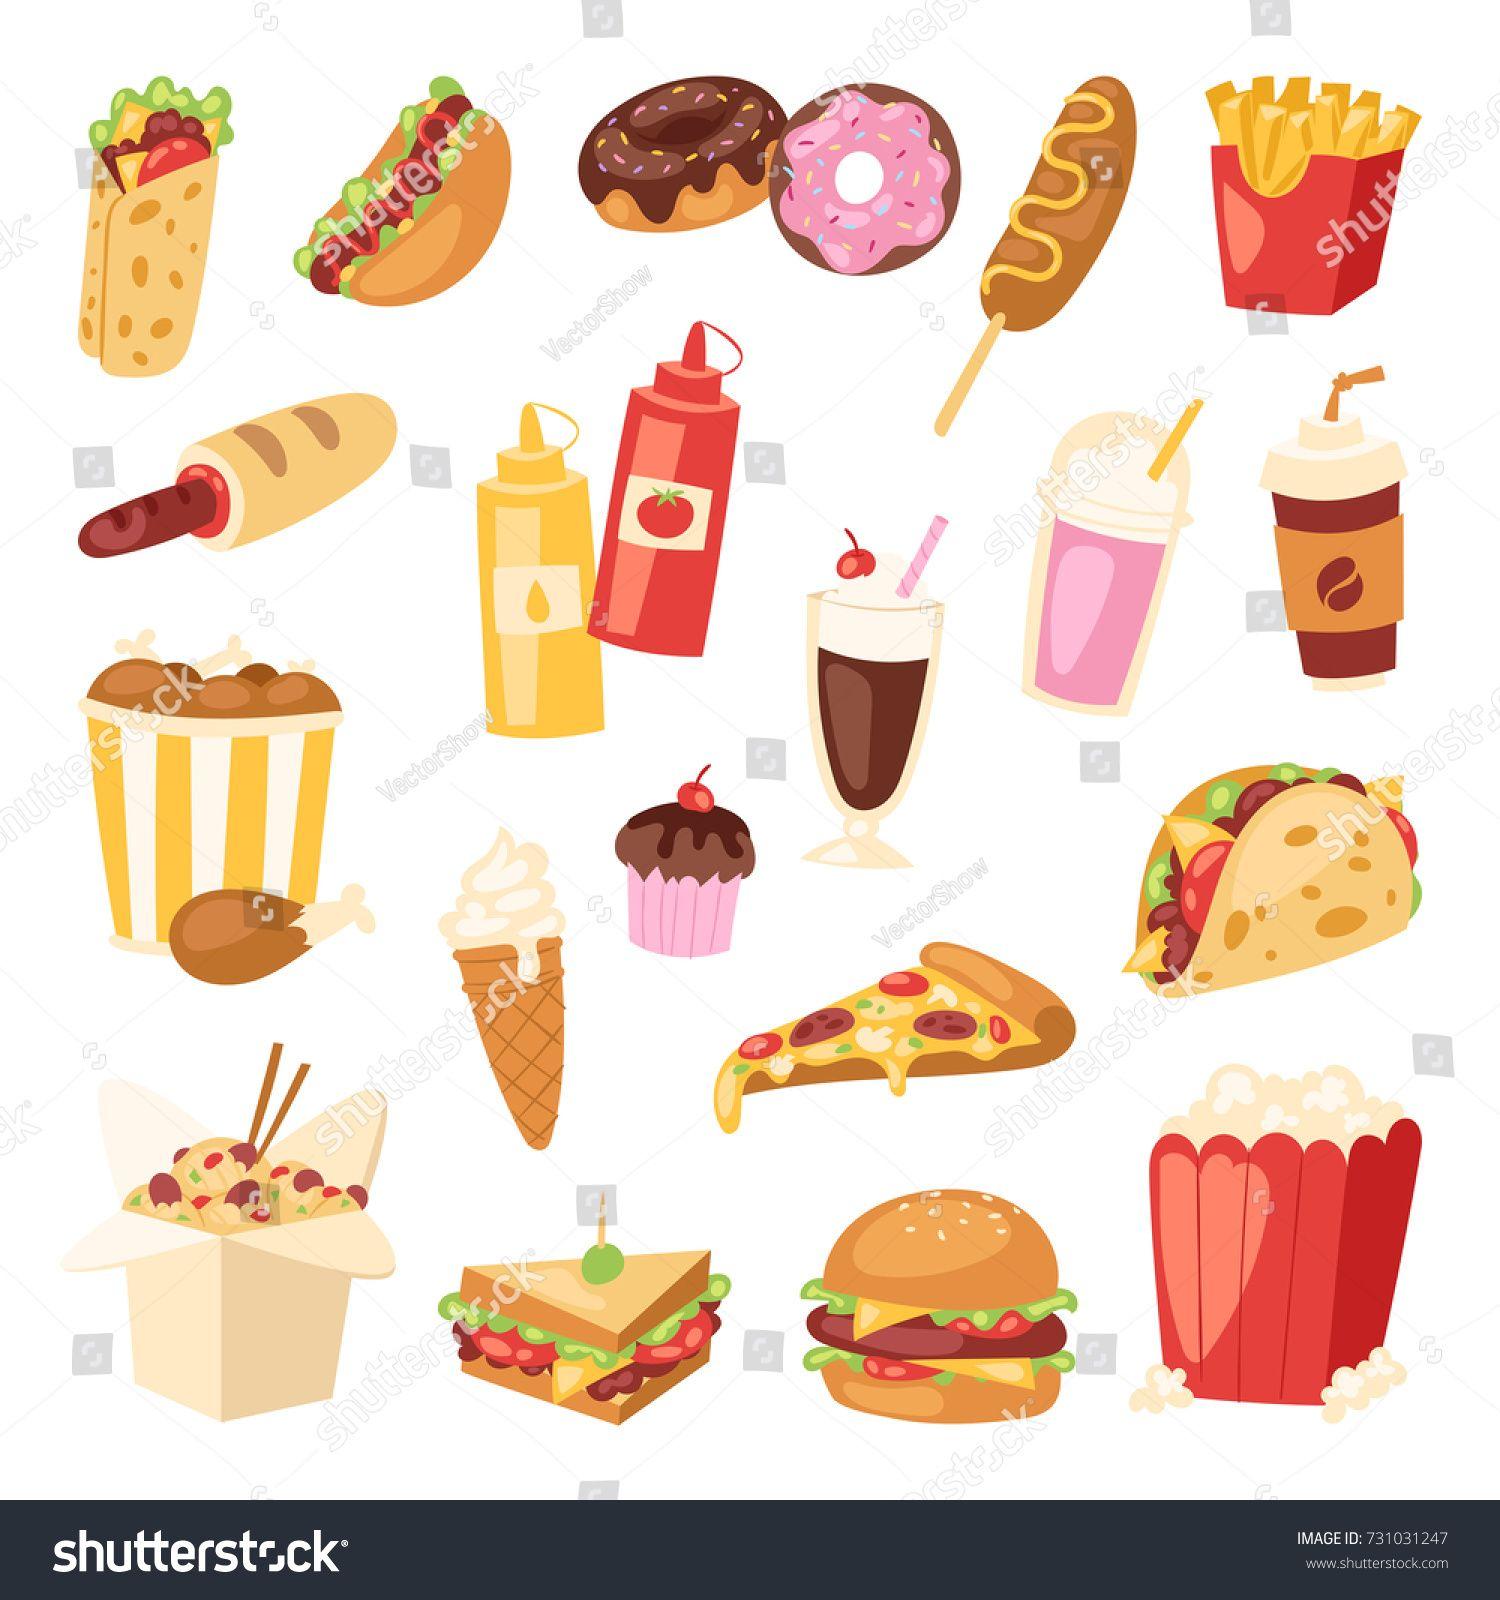 Cartoon Fast Food Unhealthy Burger Sandwich Hamburger Pizza Meal